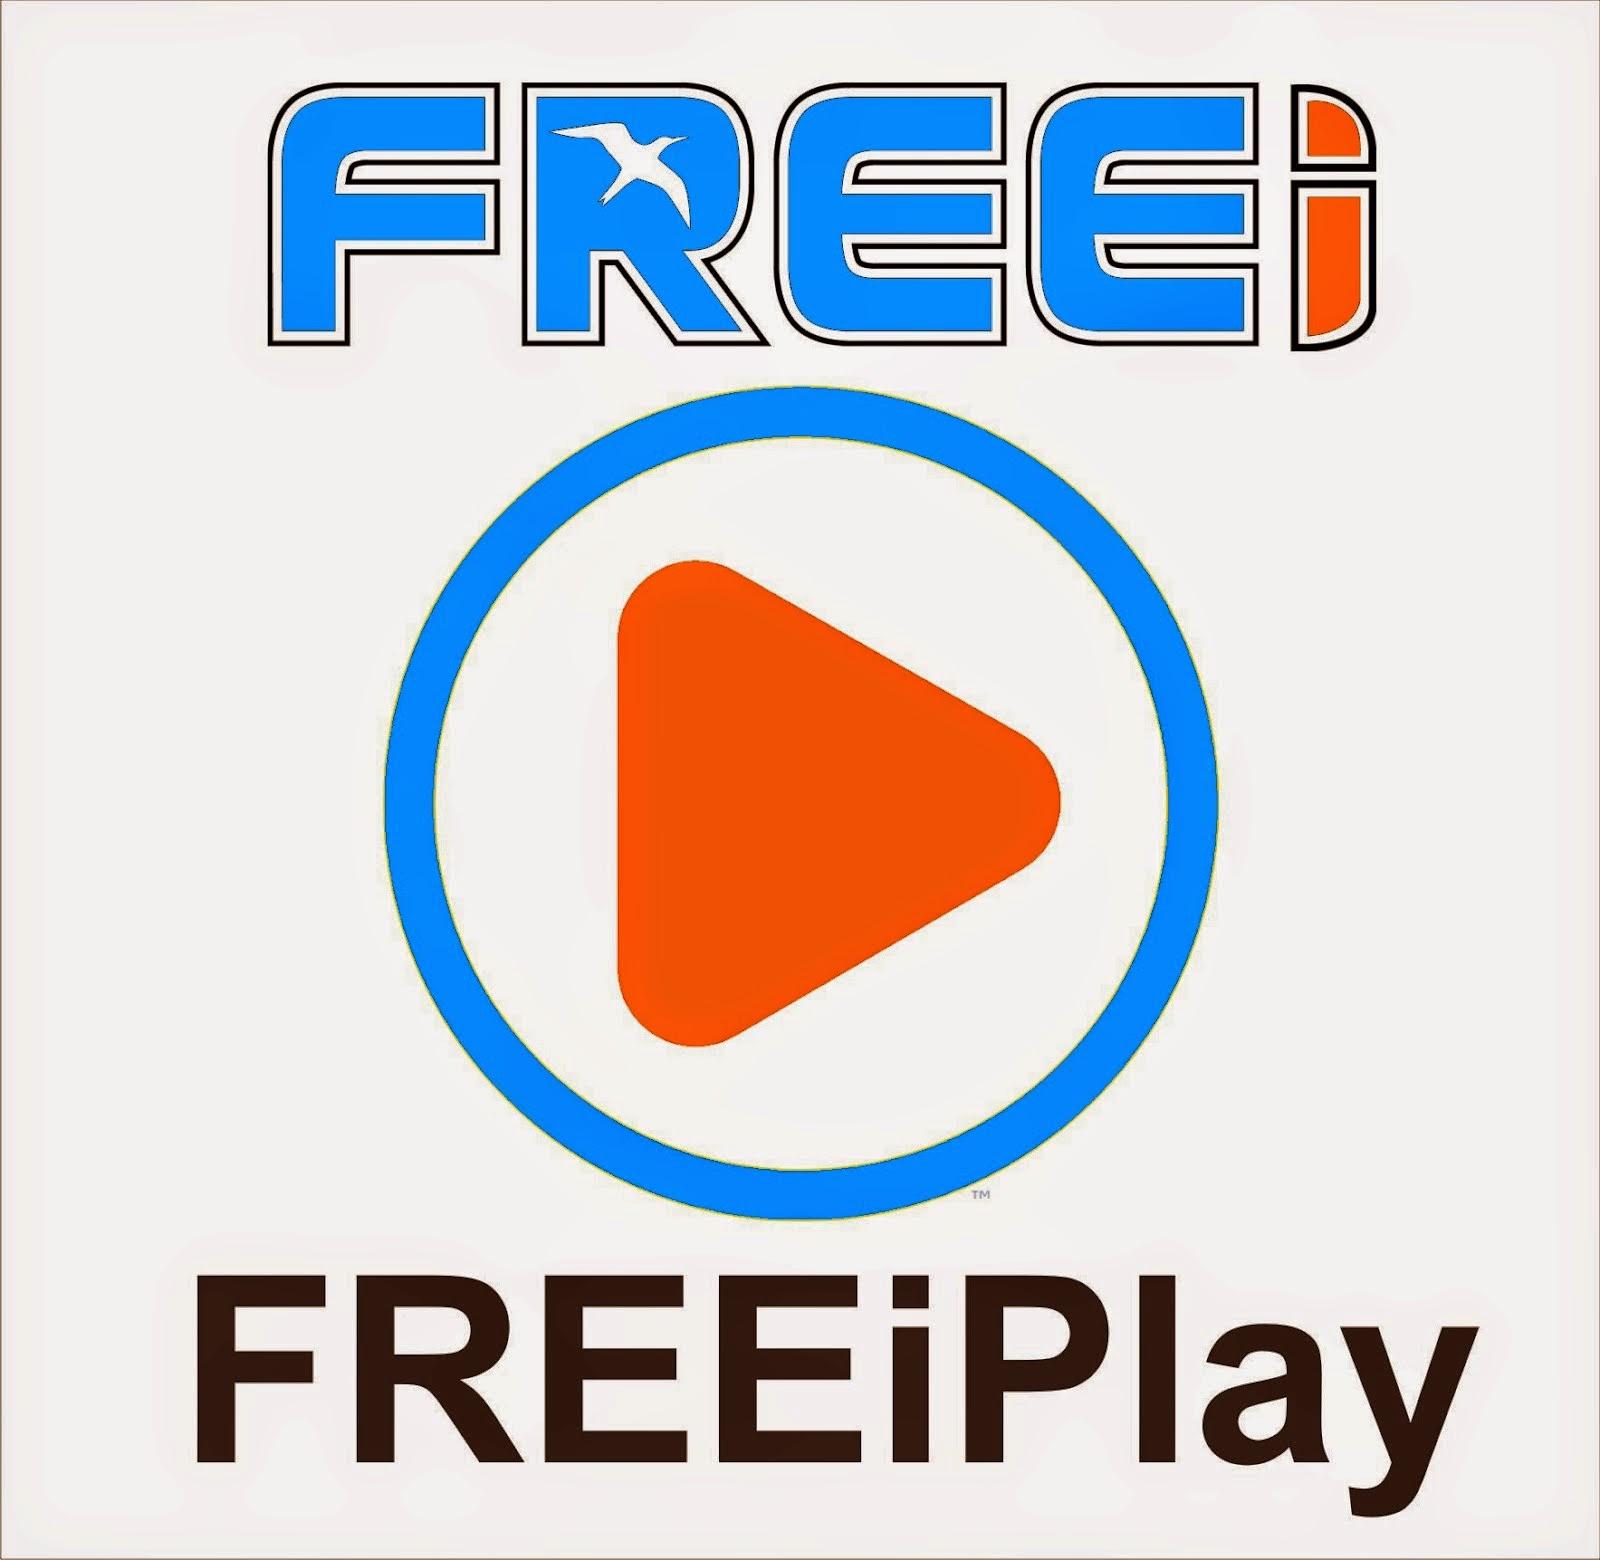 freei - FREEI PETRA HD IPTV SATELITE - NOVA VERSÃO FREEI PLAY - V 1.2 -  Freeiplay%2Bapk